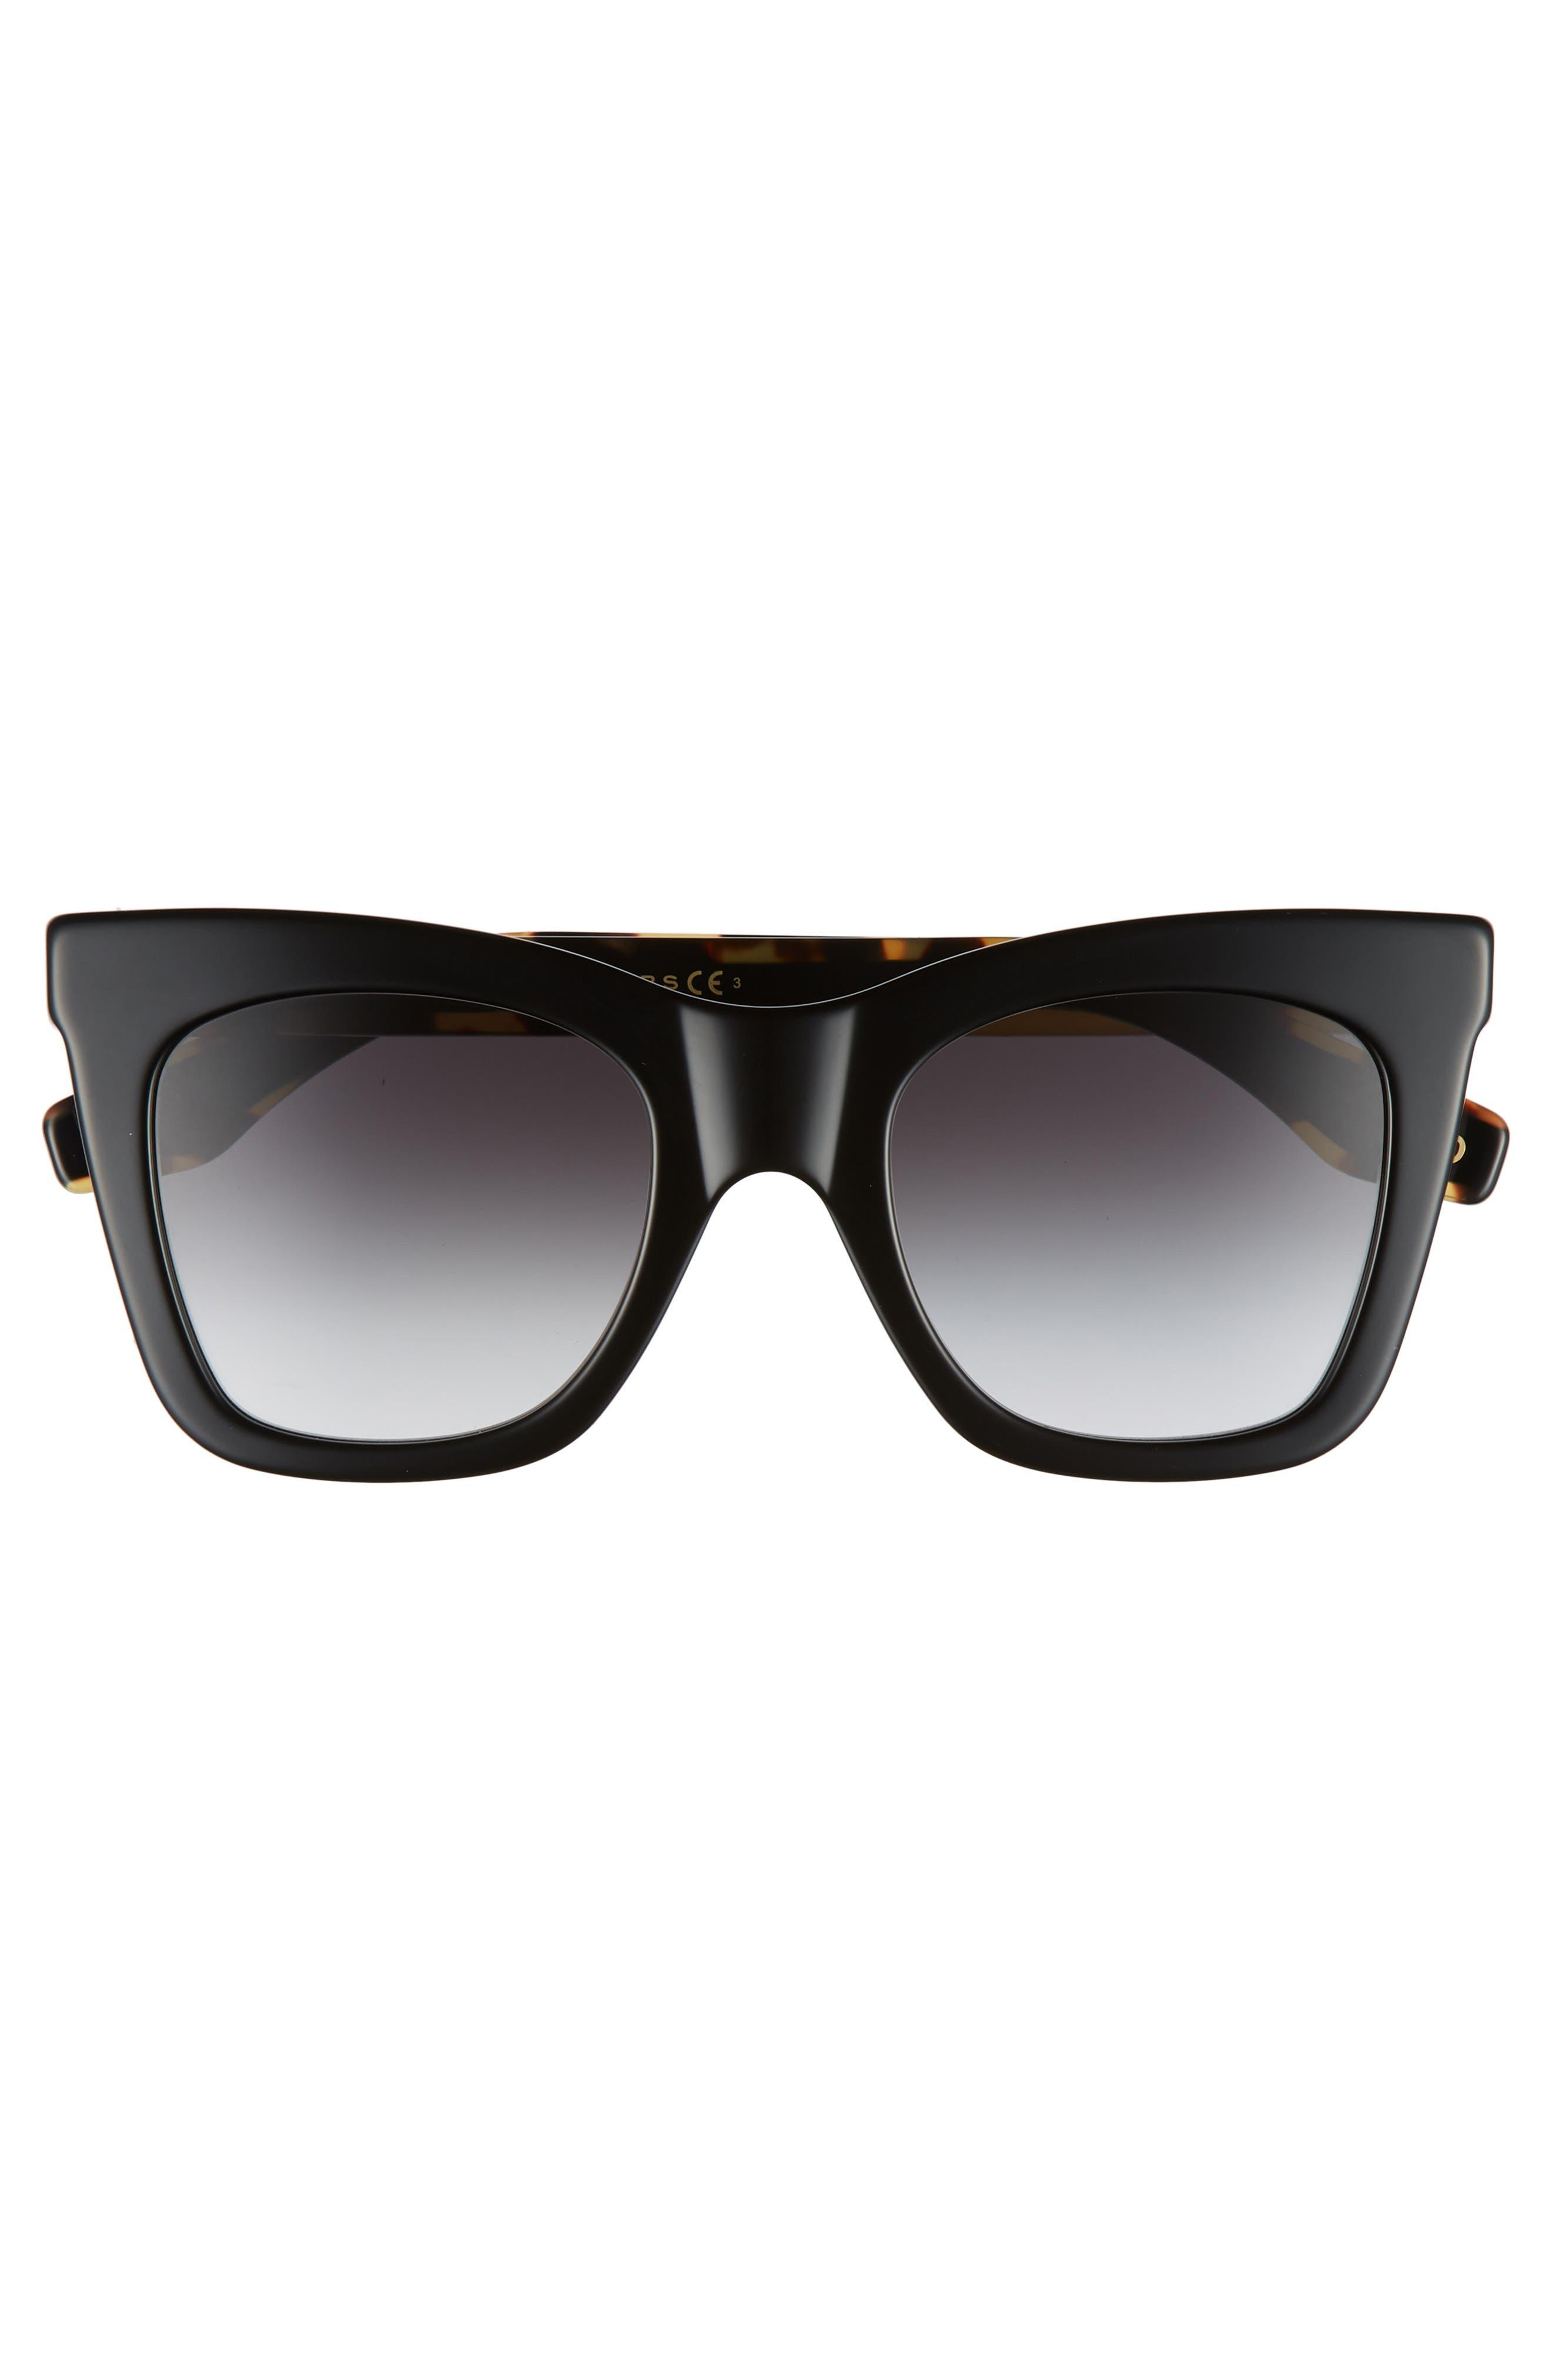 50mm Cat Eye Sunglasses,                             Alternate thumbnail 3, color,                             BLACK